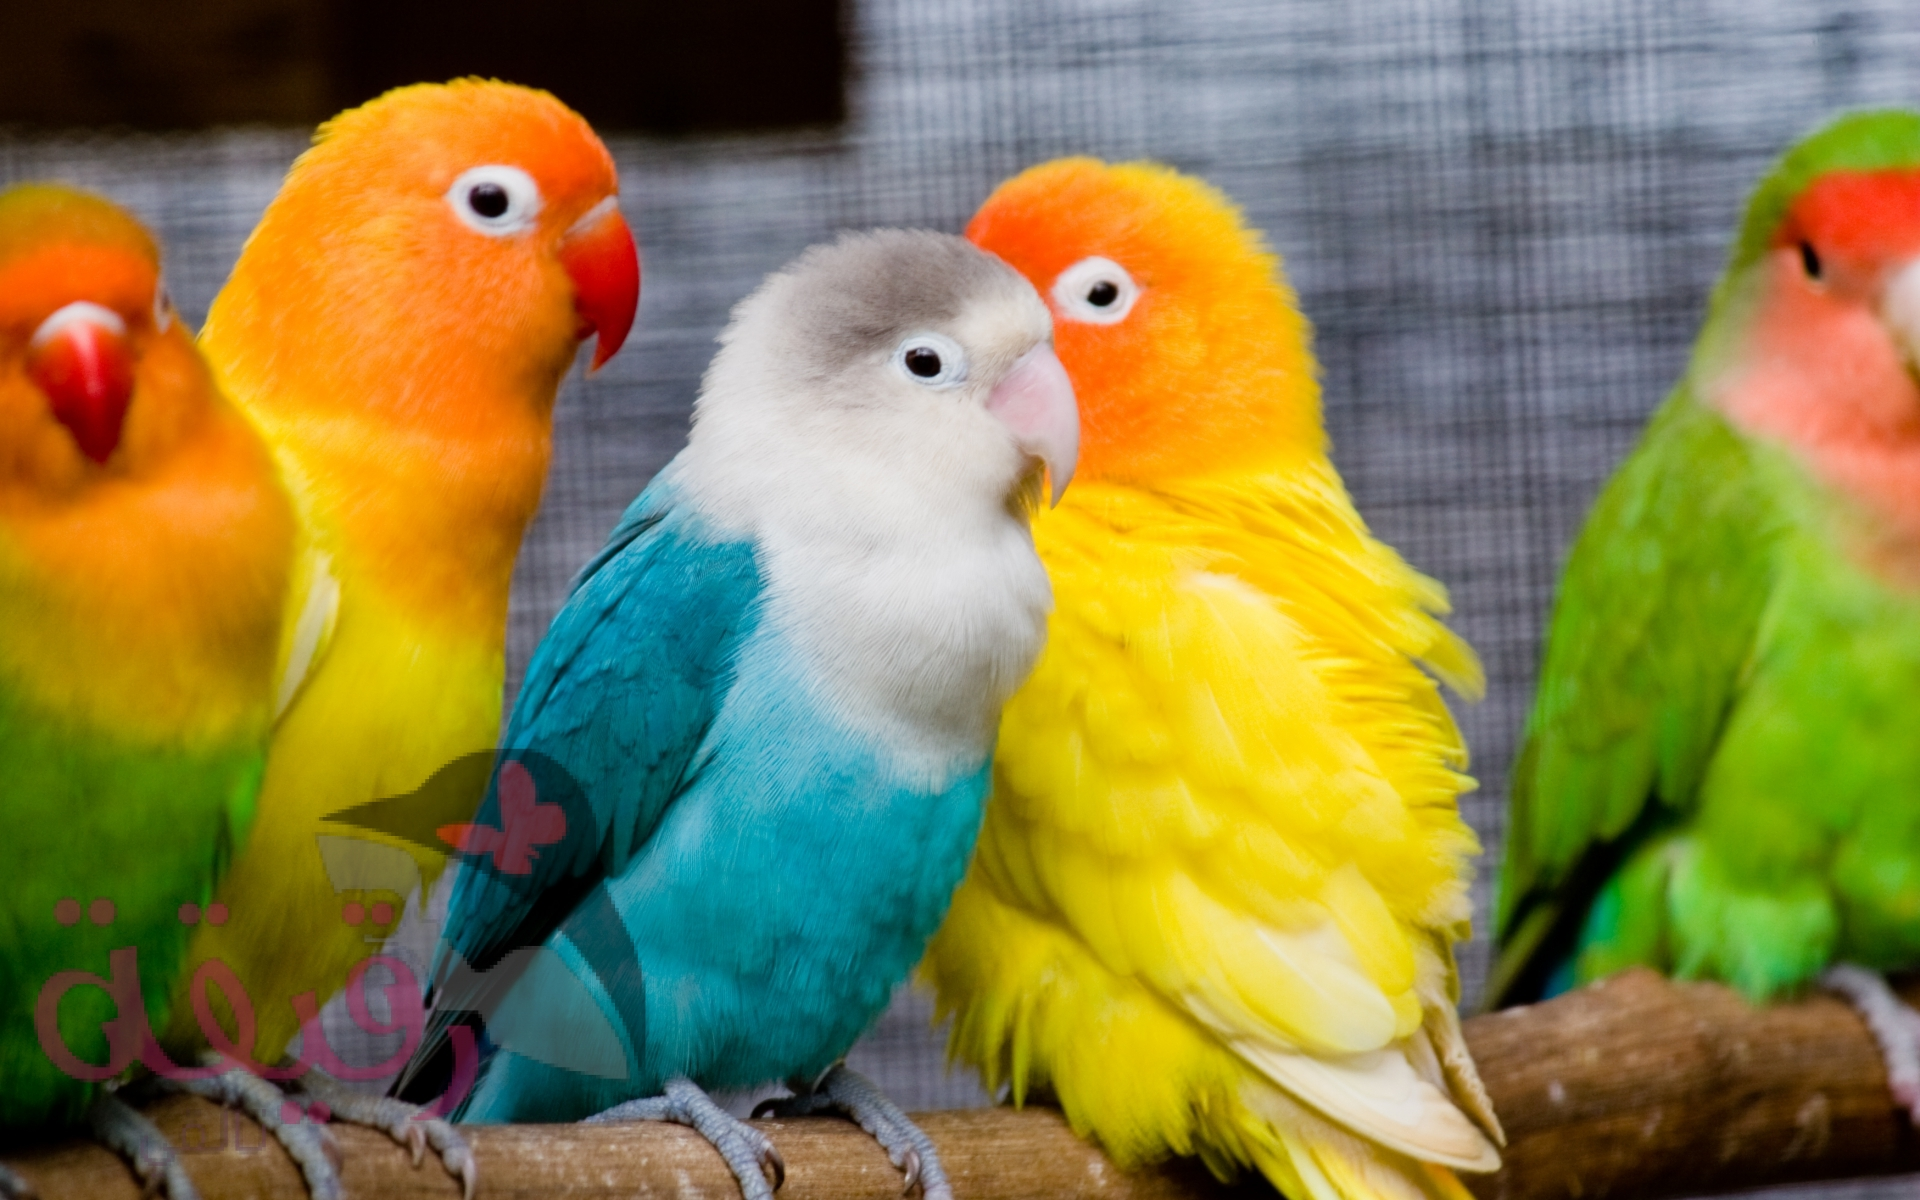 بالصور صور عصافير , عصافير ملونة نادرة 1575 9